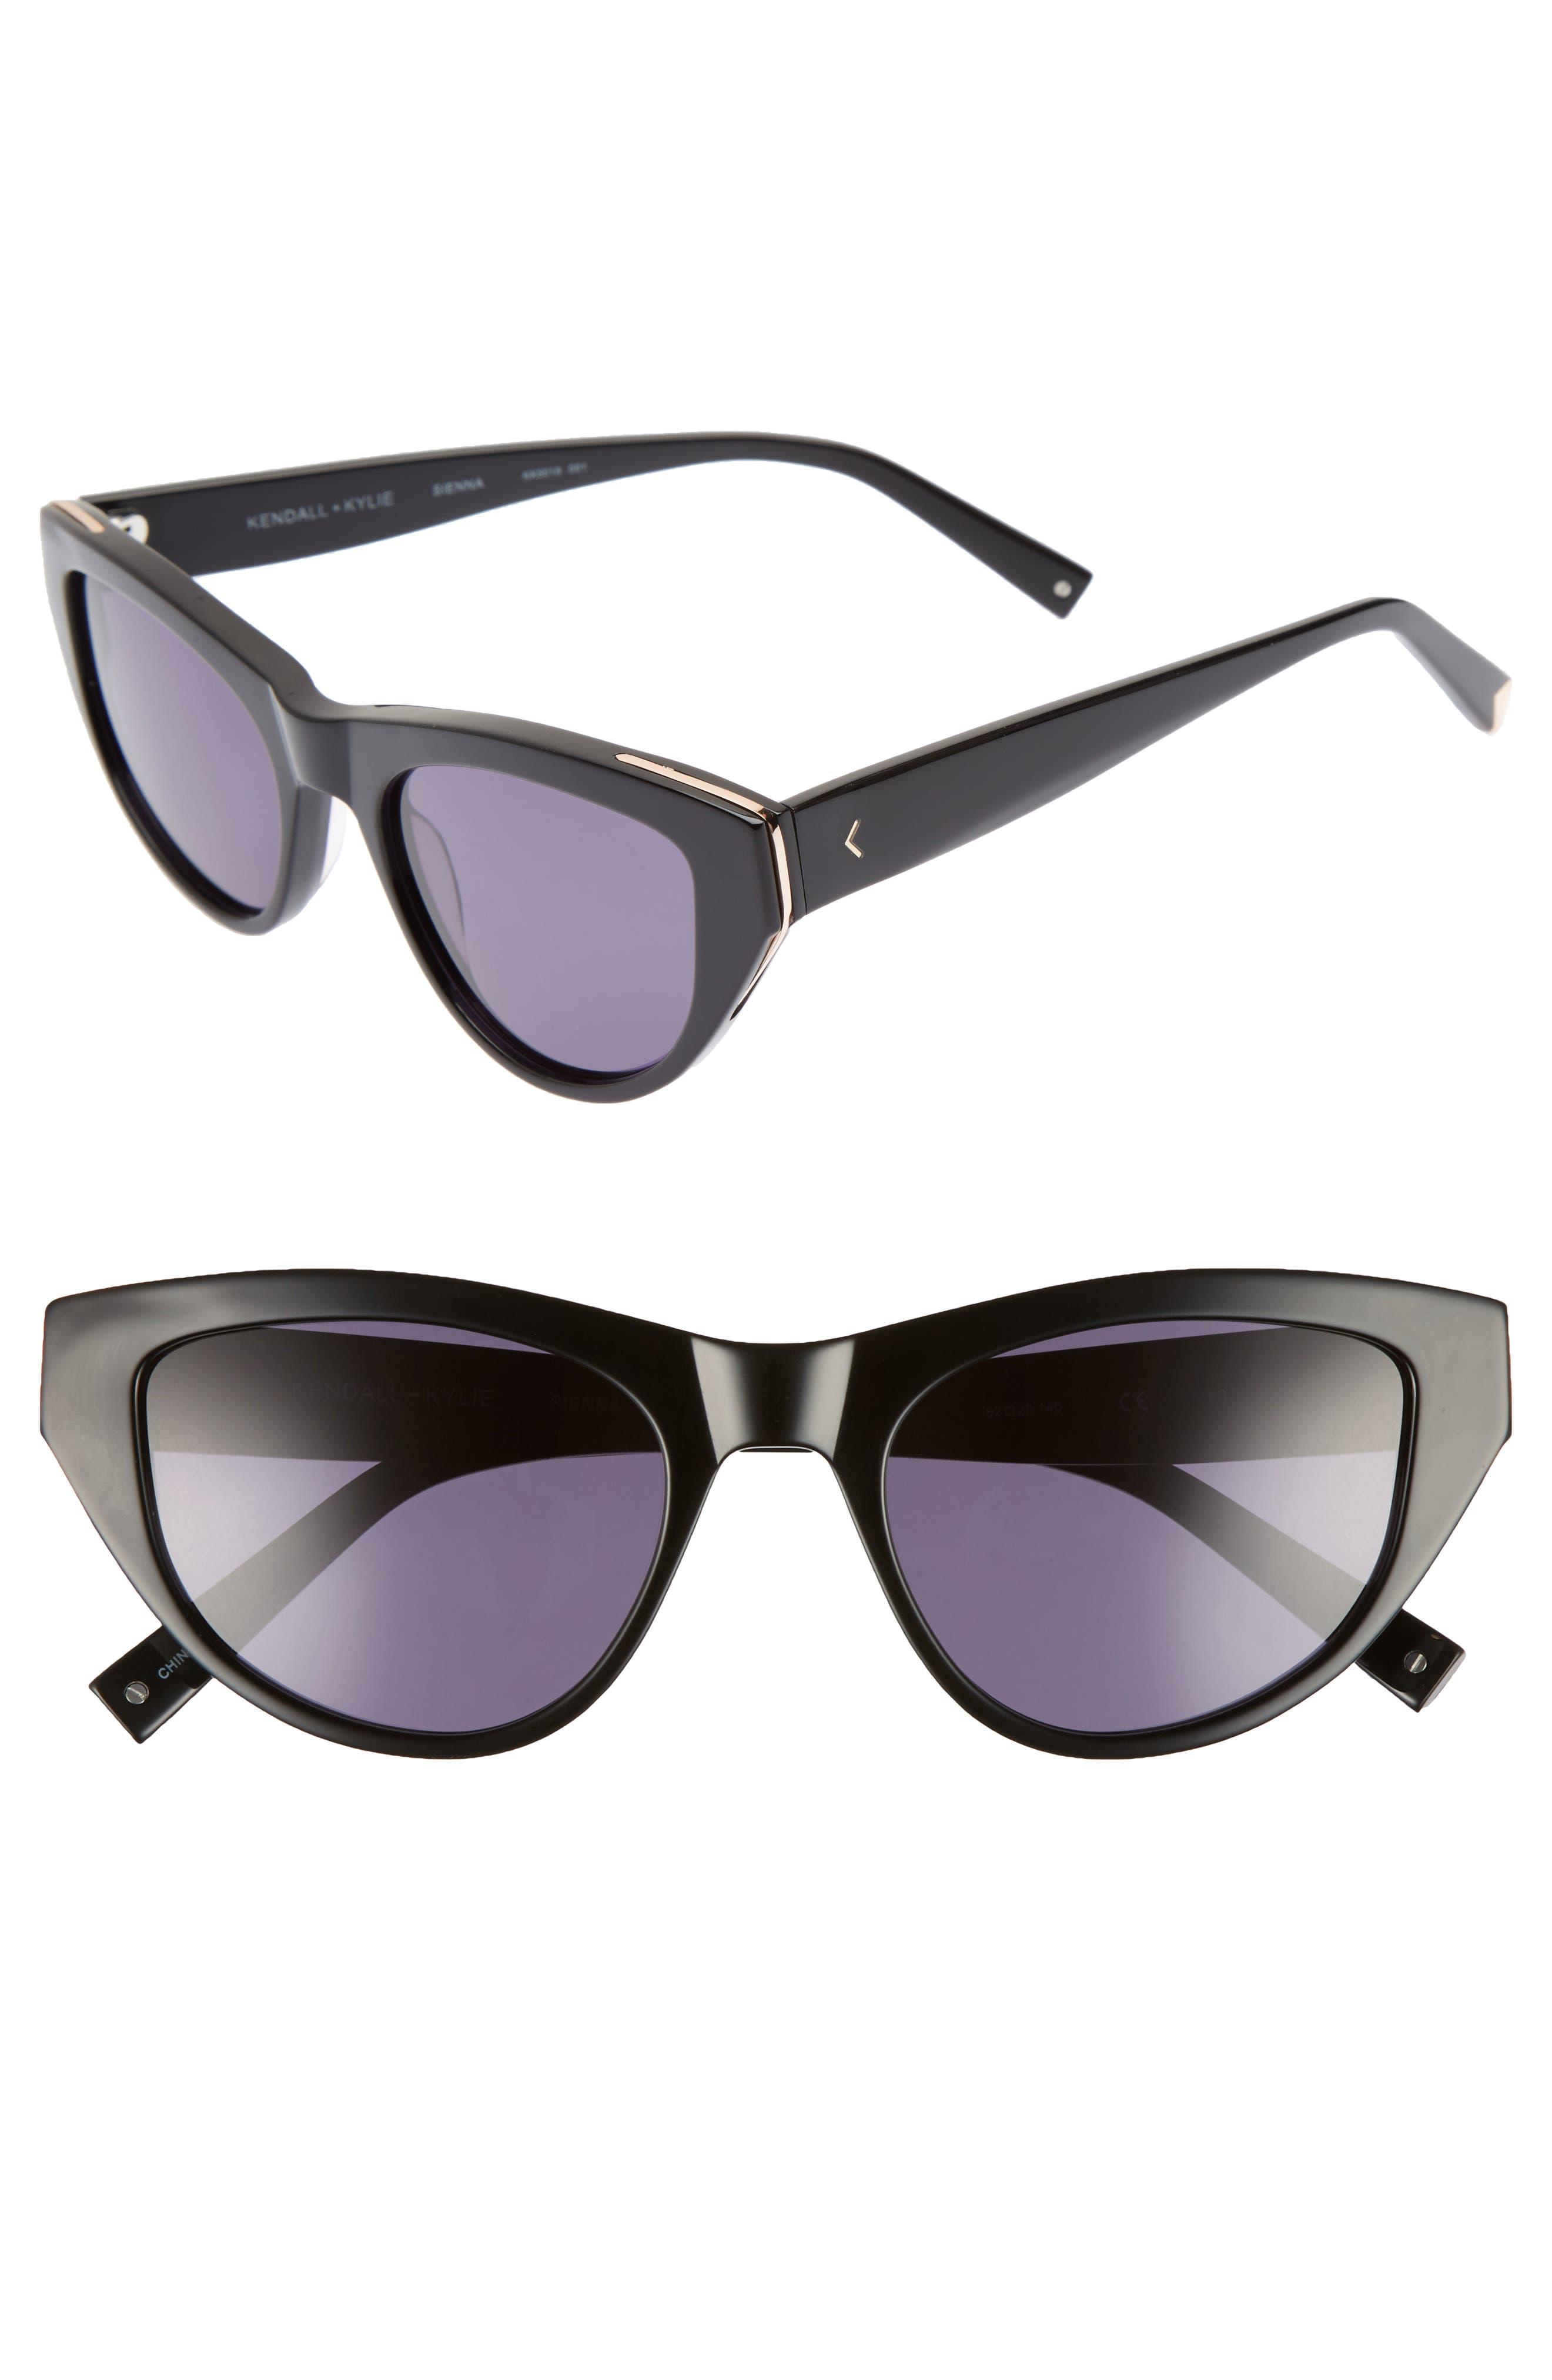 Sienna 52mm Retro Cat Eye Sunglasses,                         Main,                         color, BLACK/ ROSE GOLD